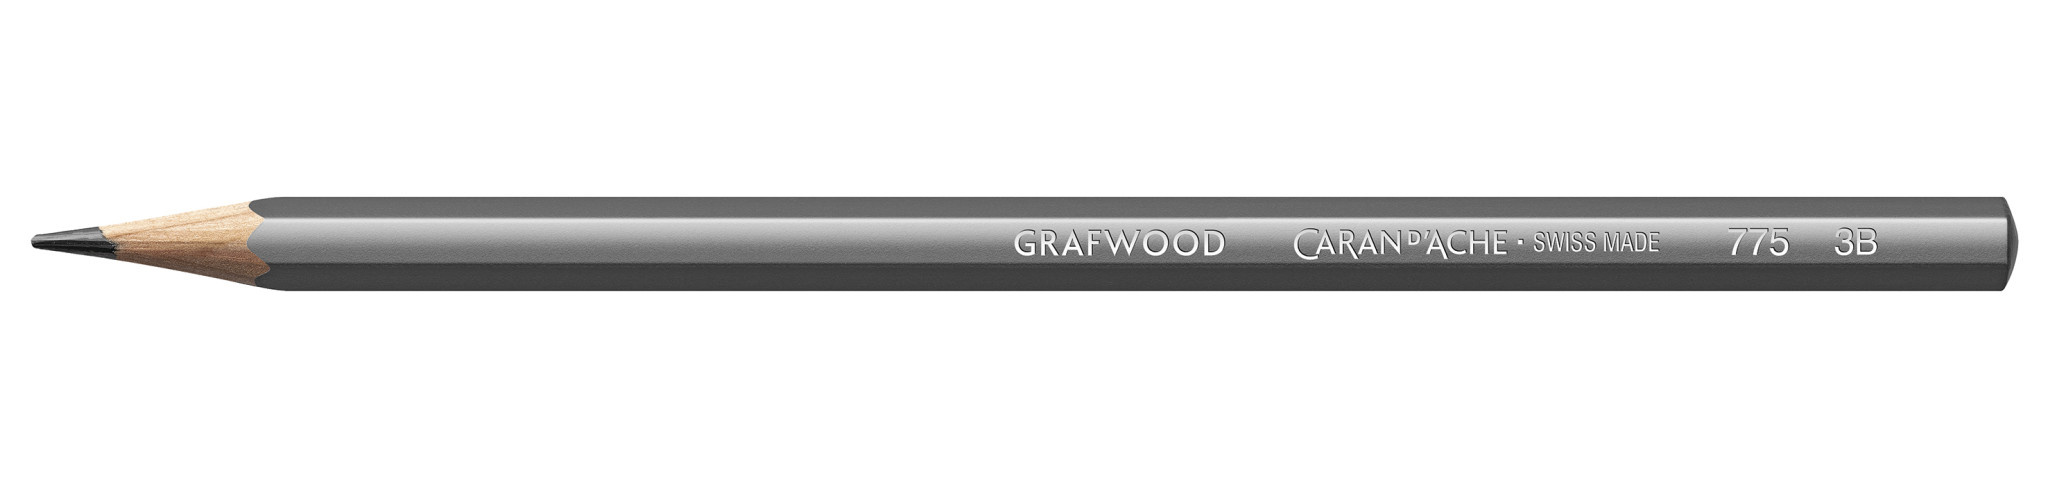 Caran d'Ache caran d'ache grafwood 3B